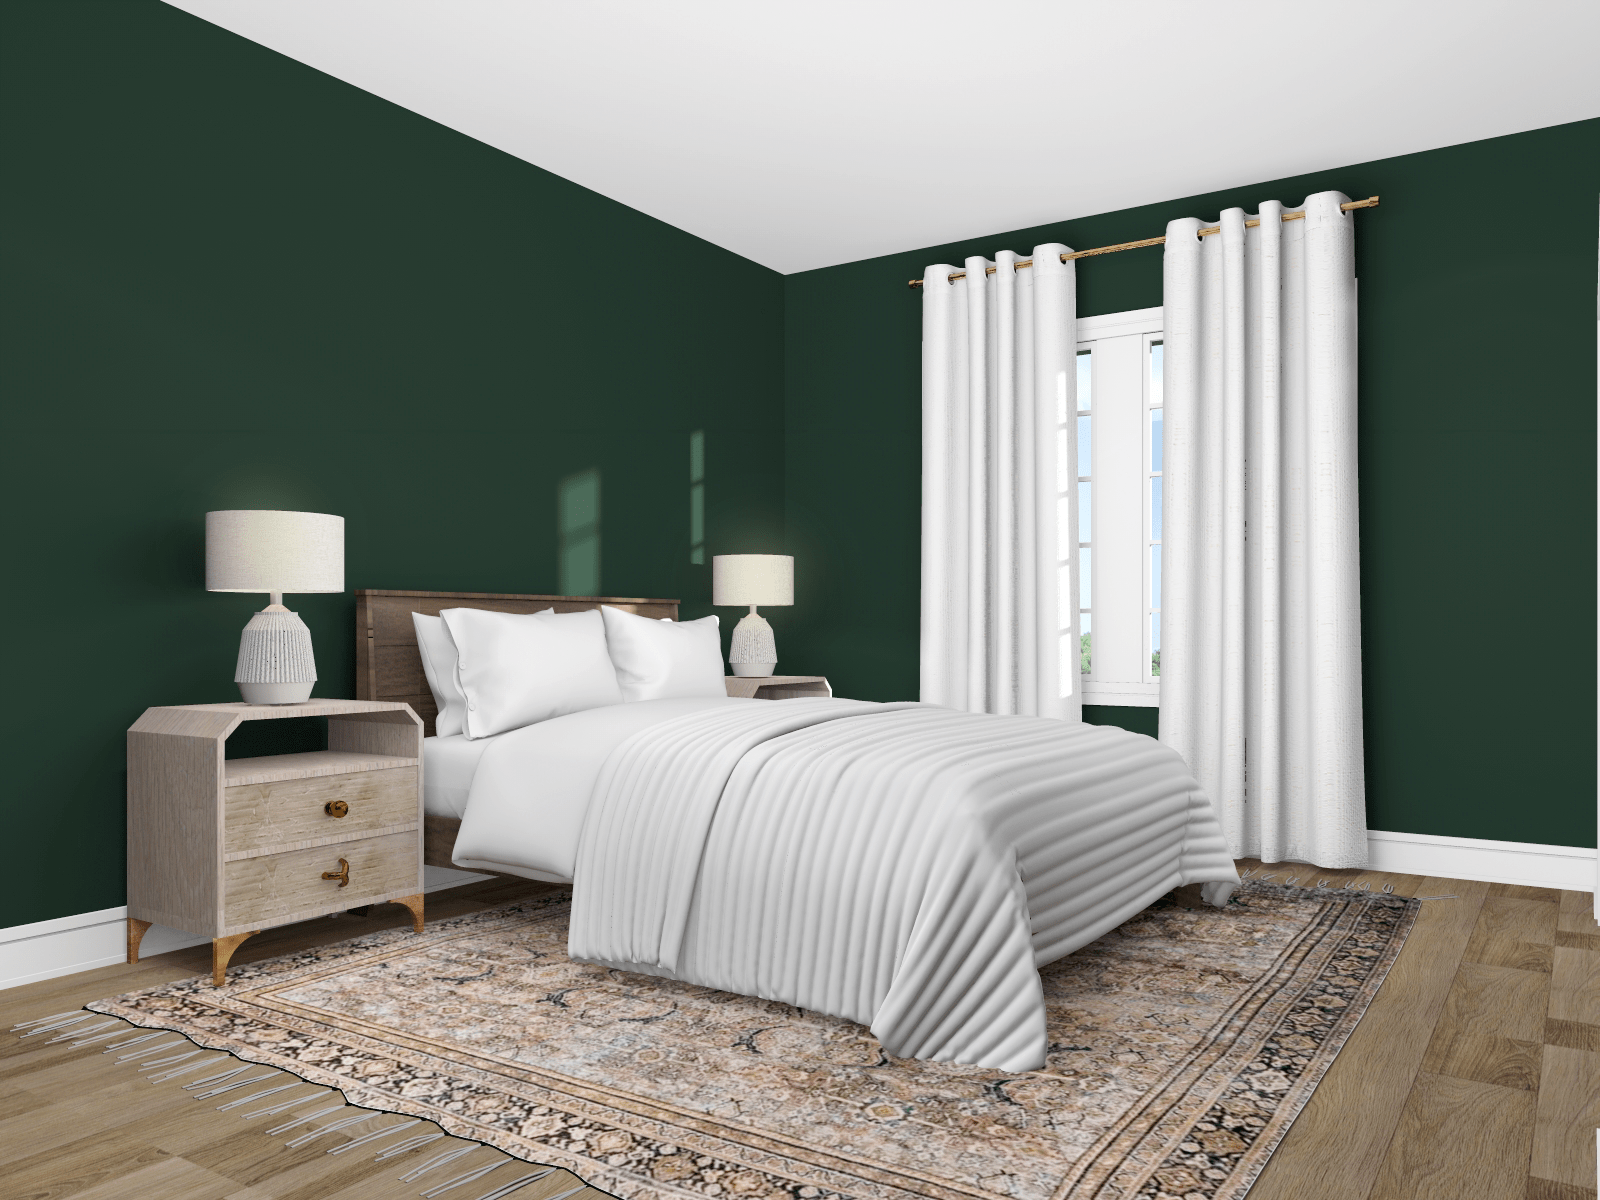 guest room rendering